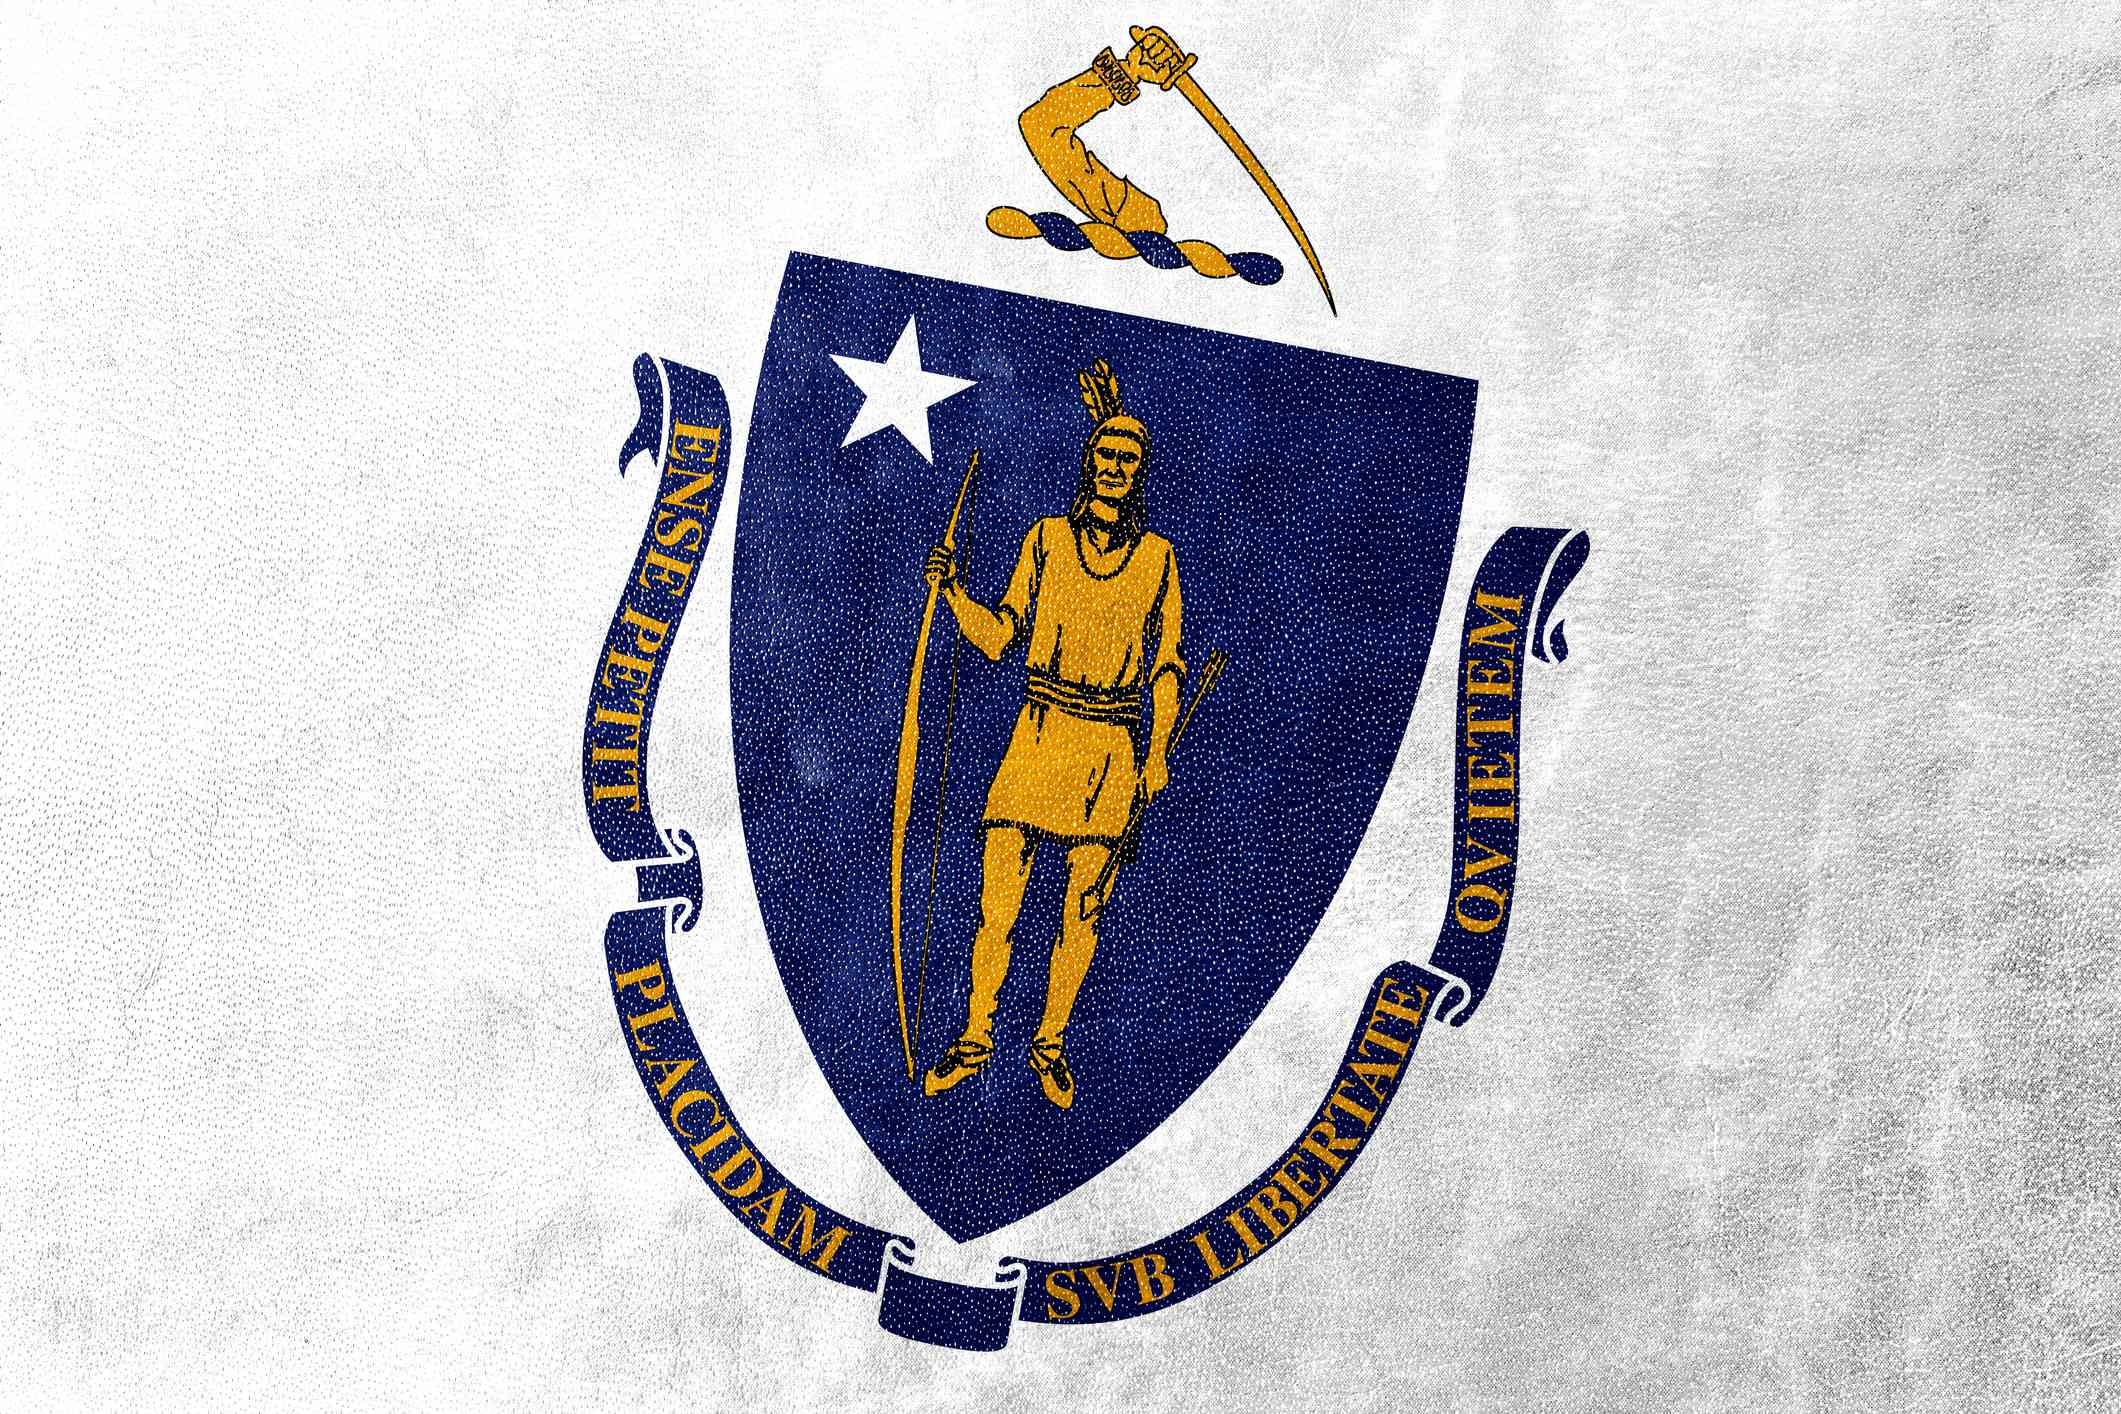 Massachusetts State Flag painted on leather texture